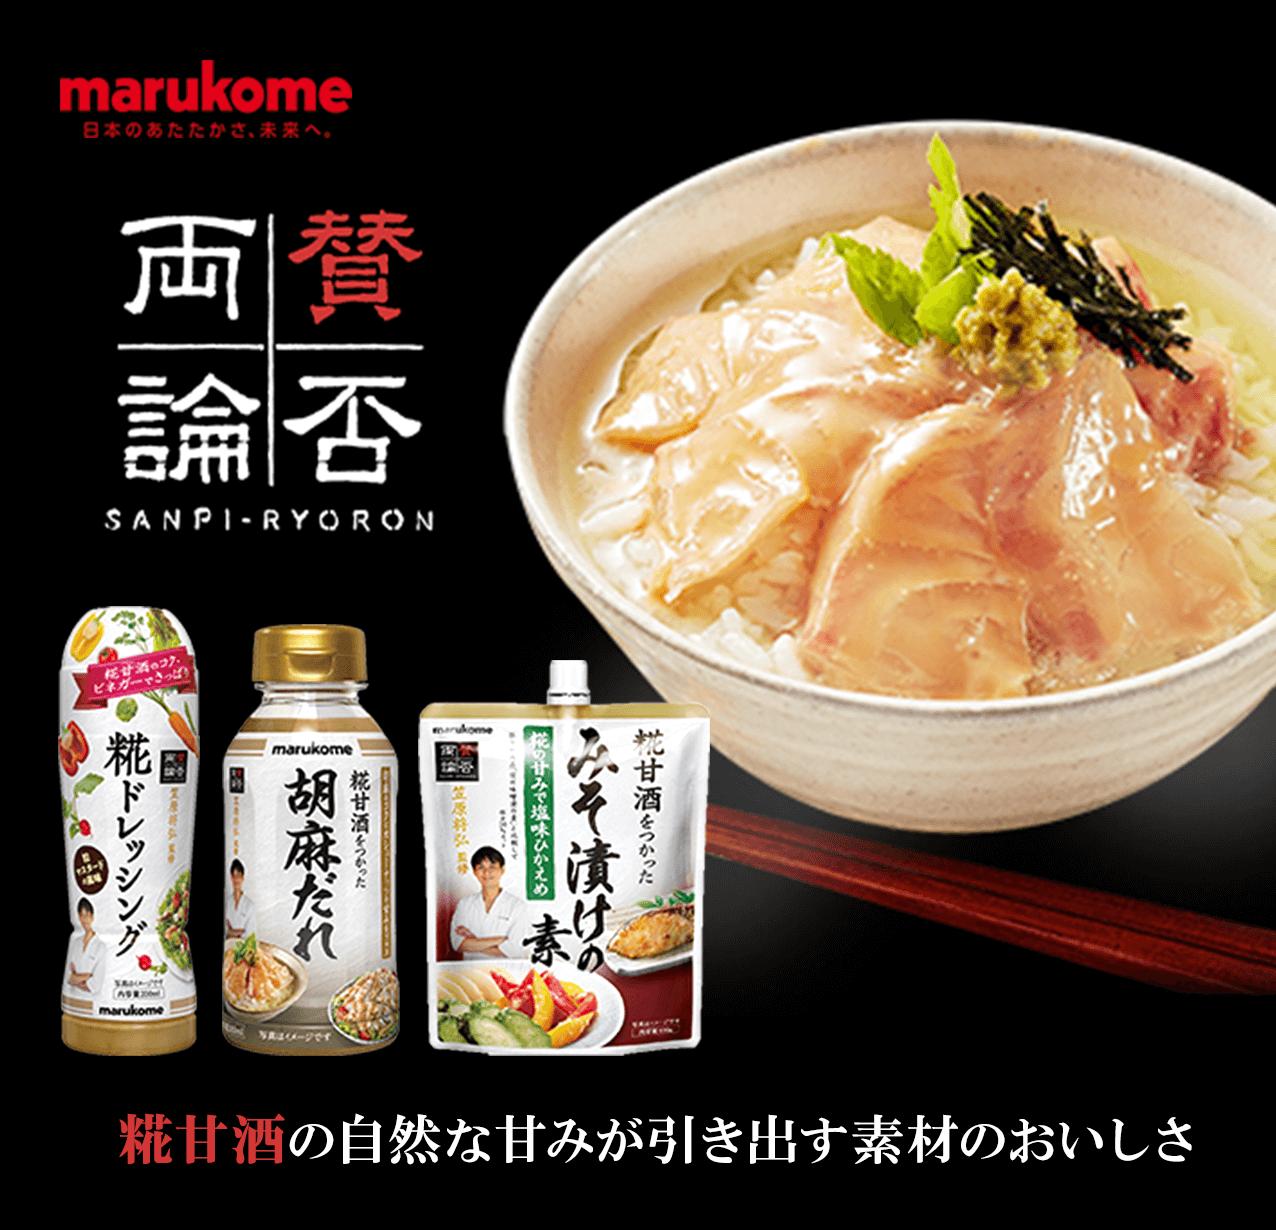 marukome 賛否両論 糀甘酒の自然な甘みが引き出す素材のおいしさ